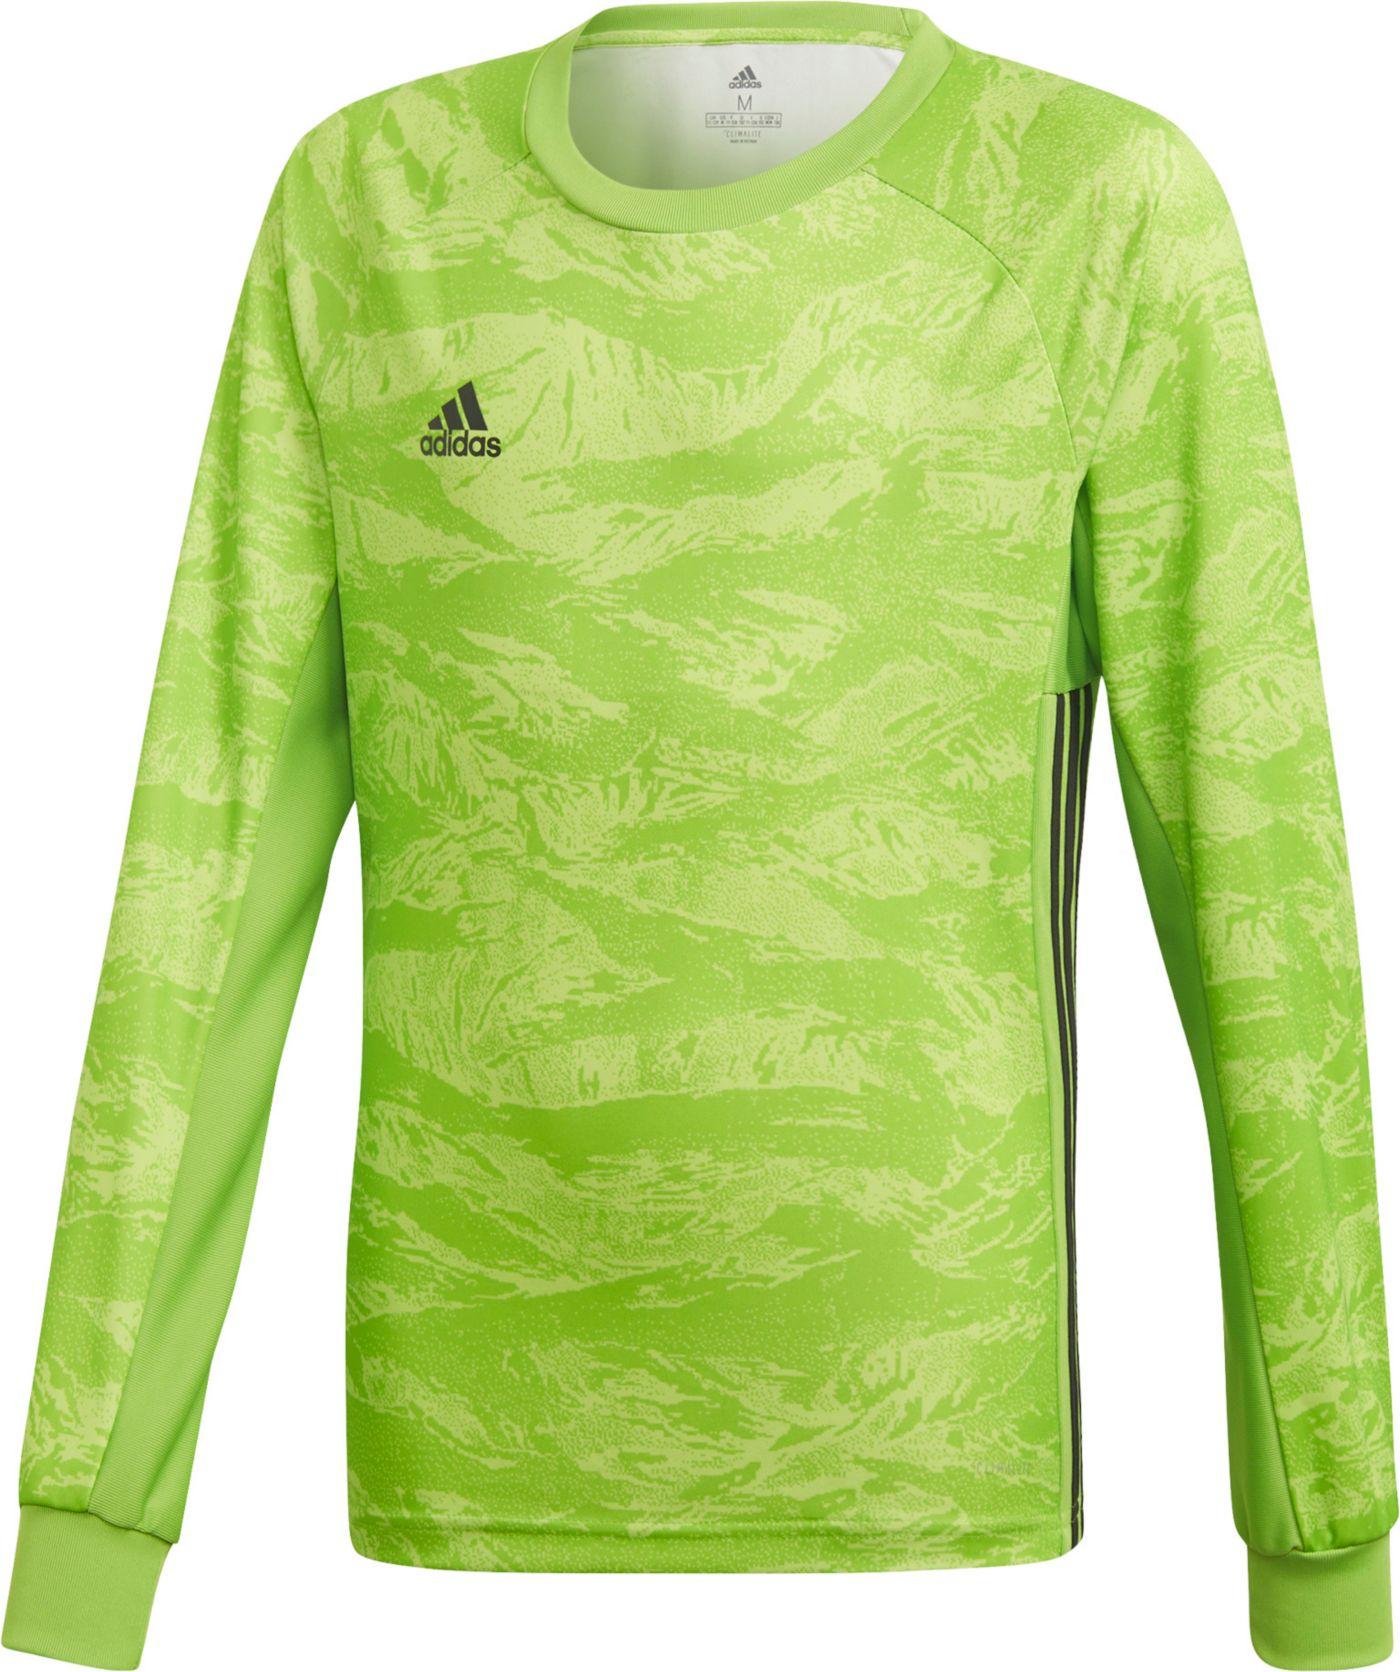 adidas Boys' Adipro 19 Goalkeeper Long Sleeve Soccer Jersey